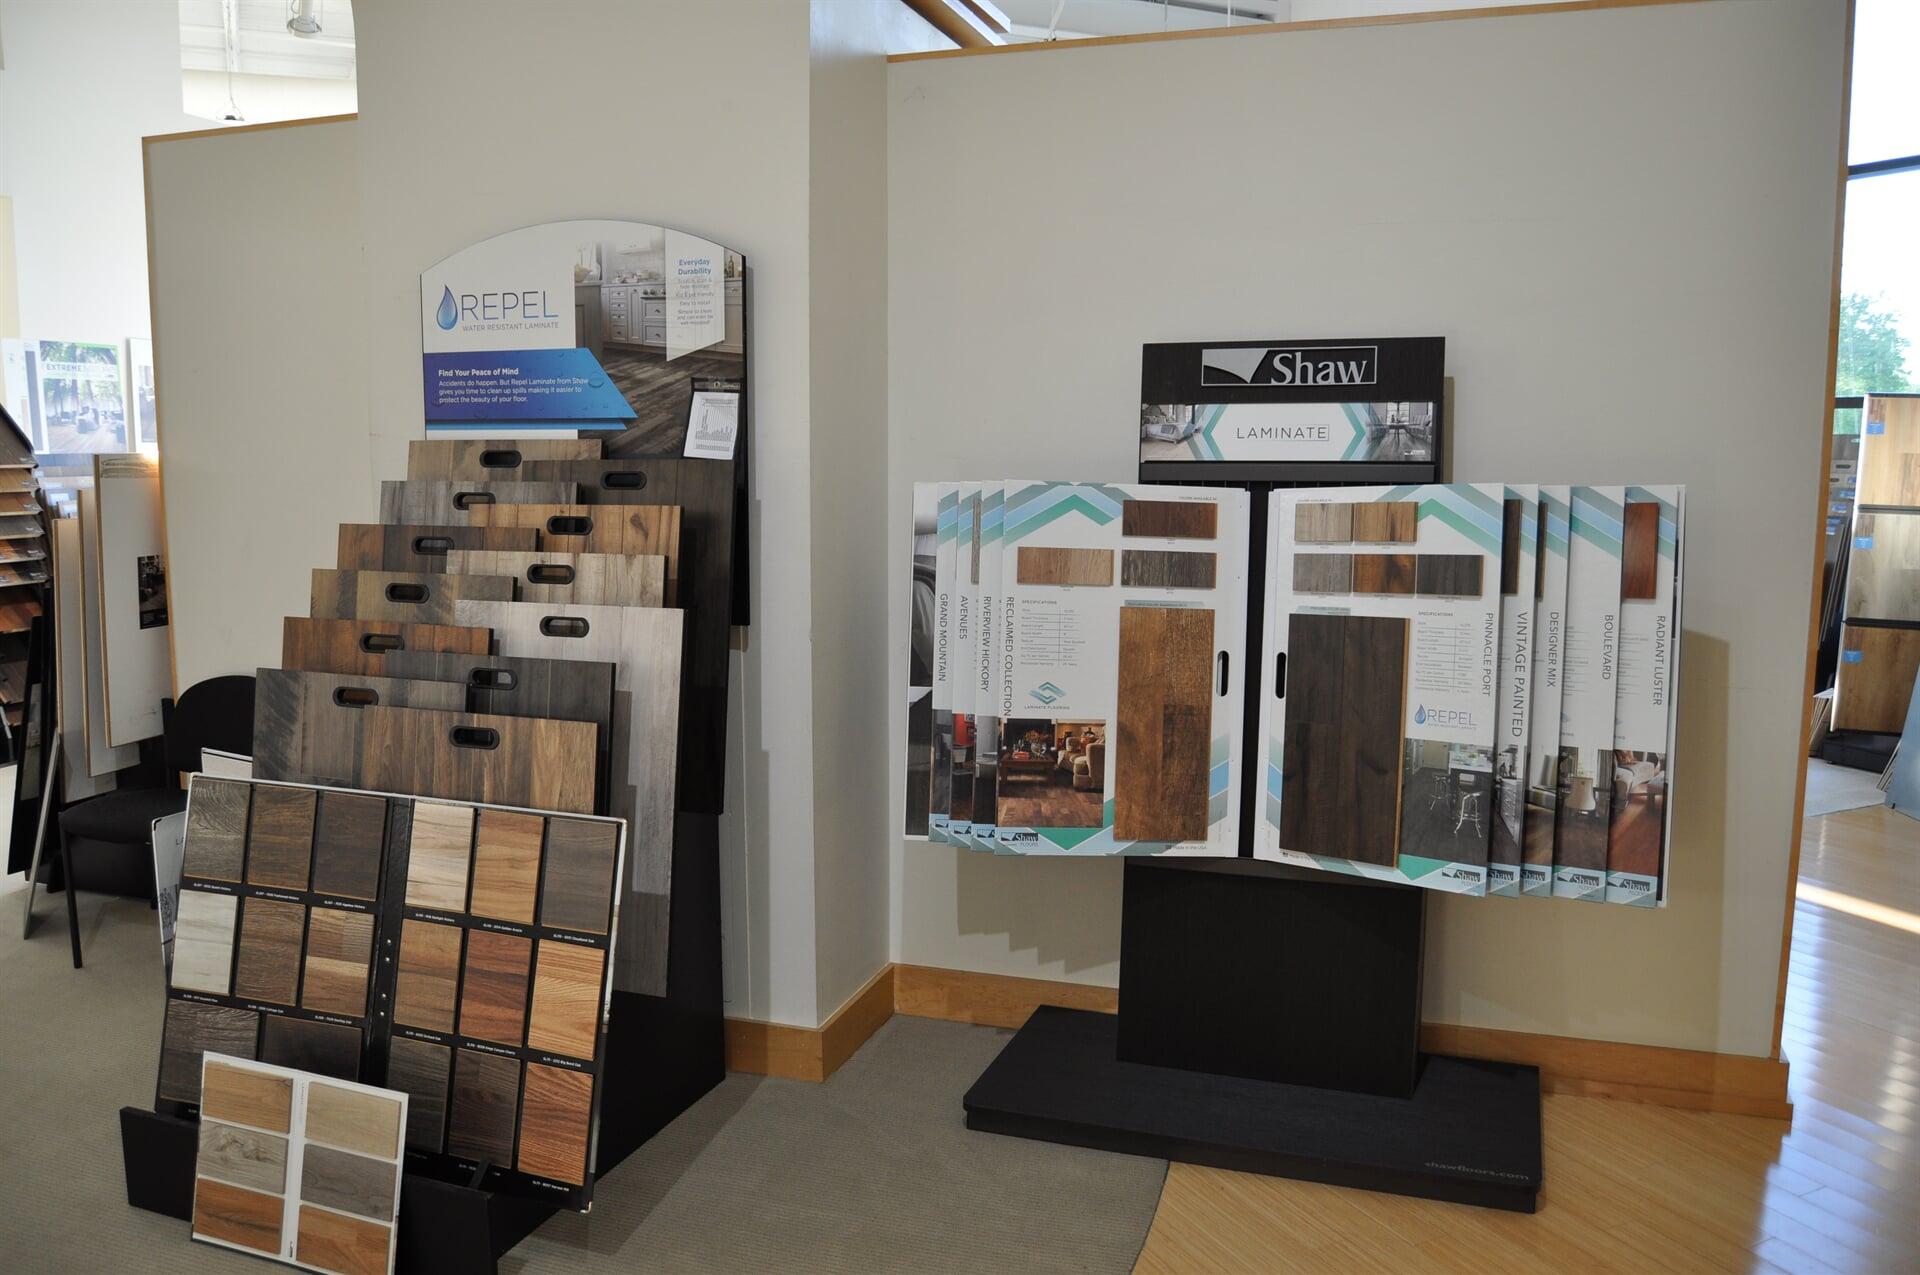 Shaw laminate flooring for your Nashville, TN home from Beckler's Flooring Center